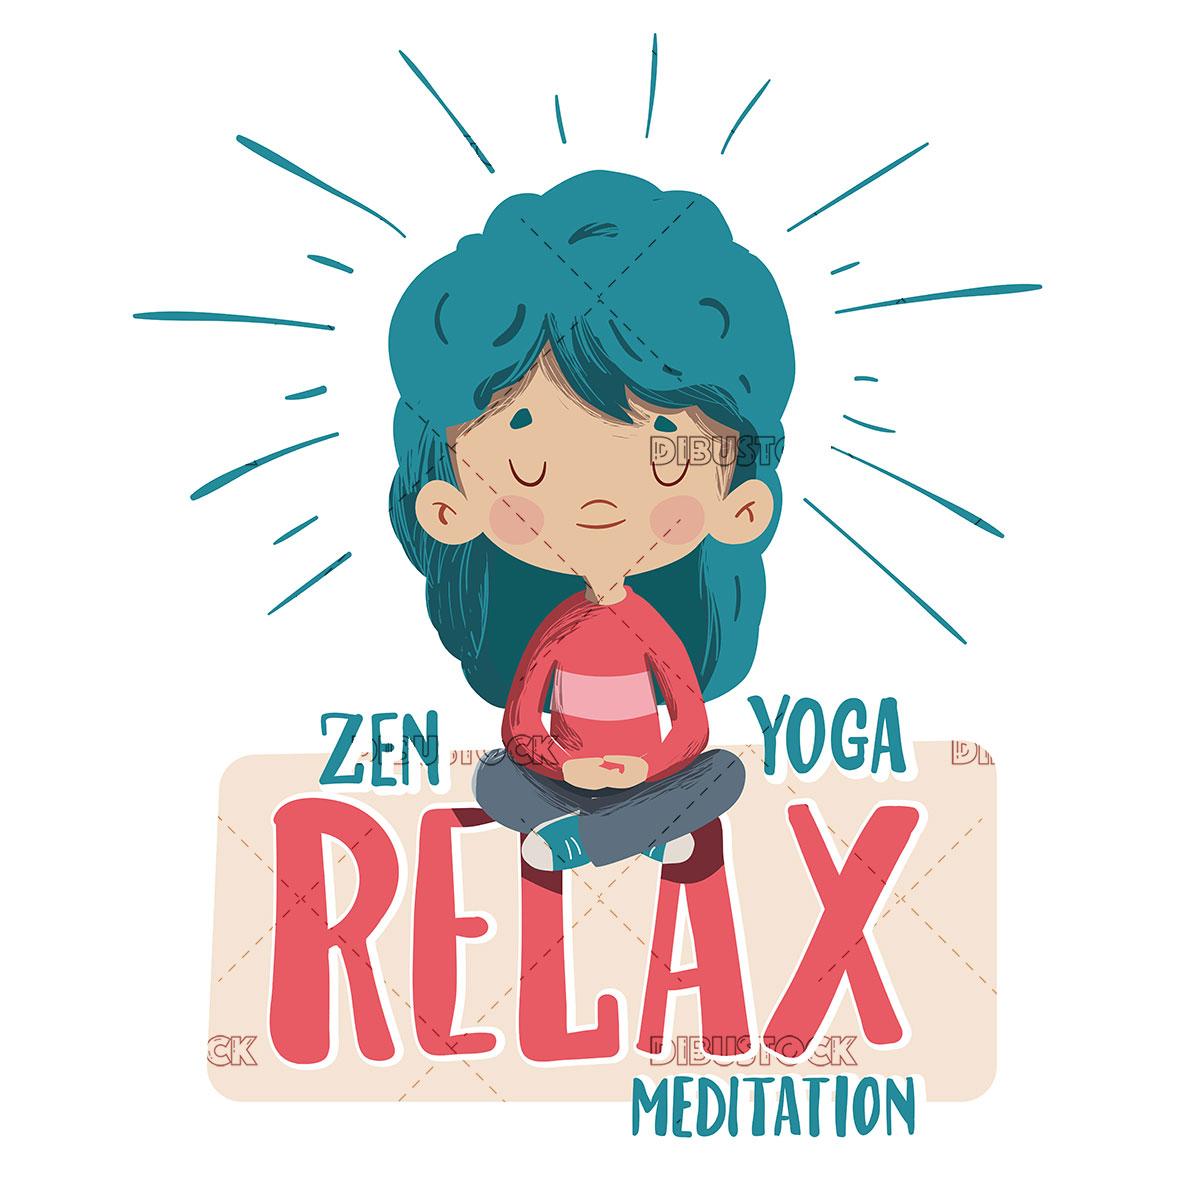 Girl meditating doing yoga